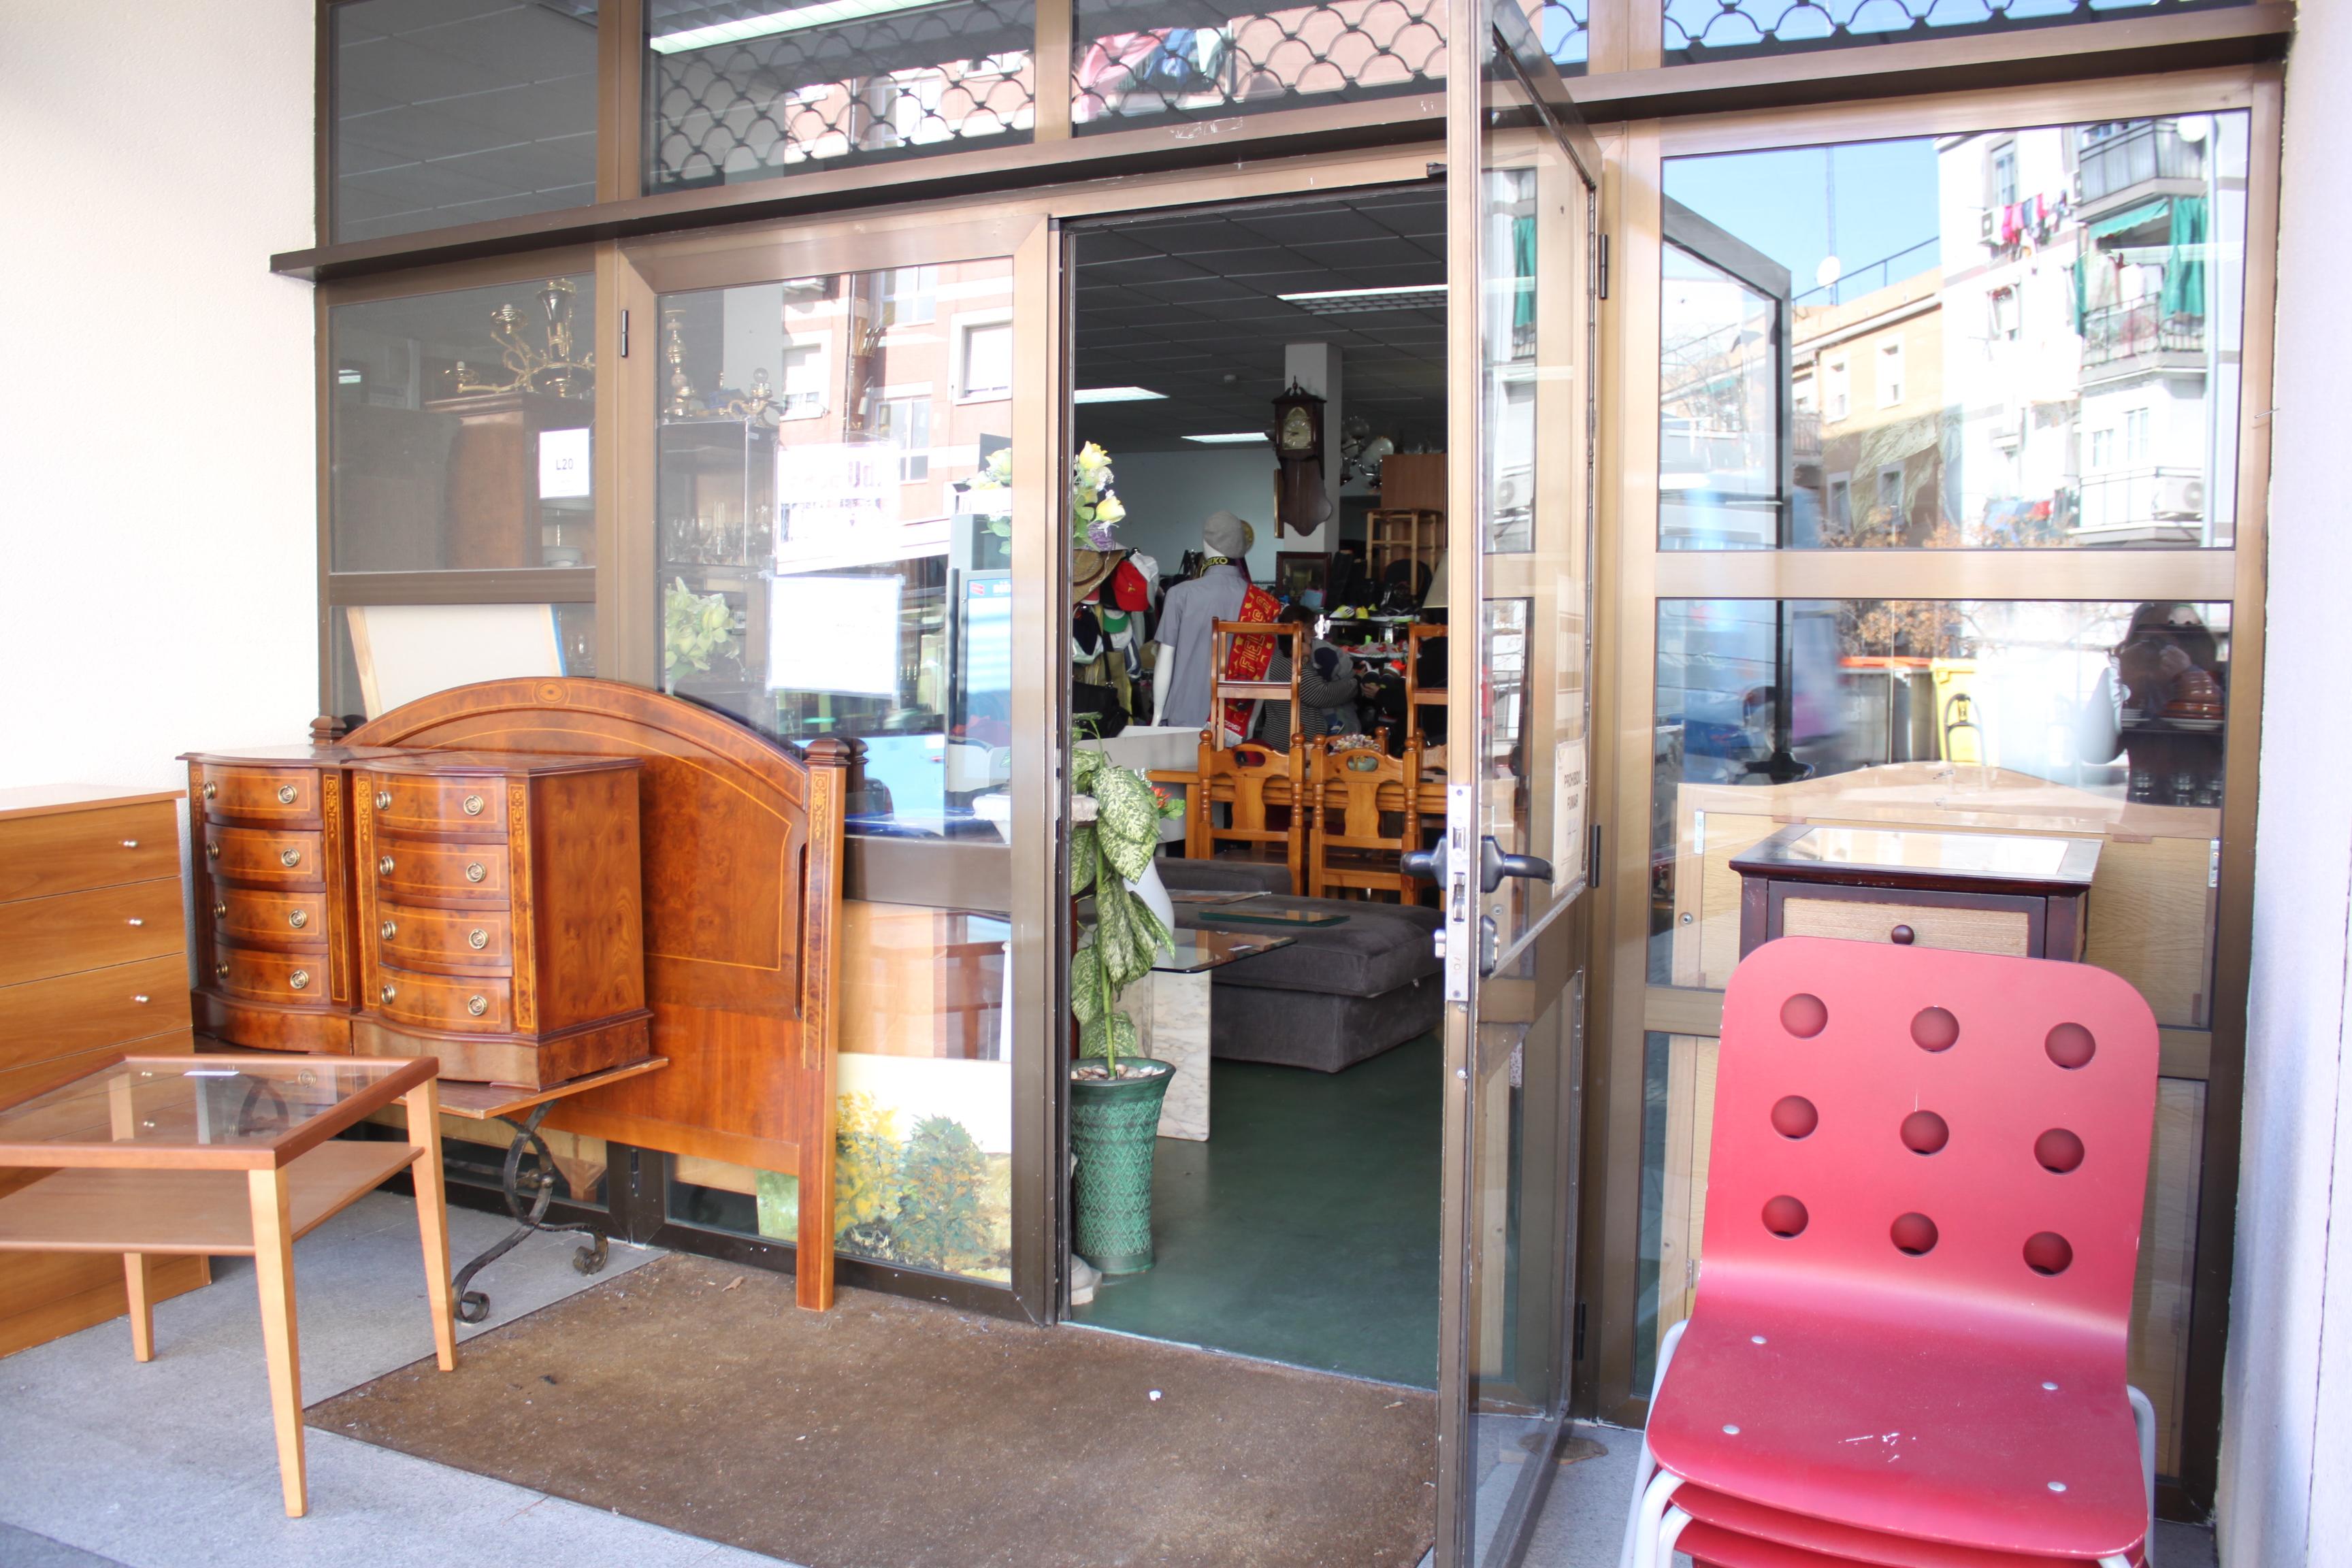 Reto Madrid Recogida Muebles : Muebles rastro reto obtenga ideas diseño de para